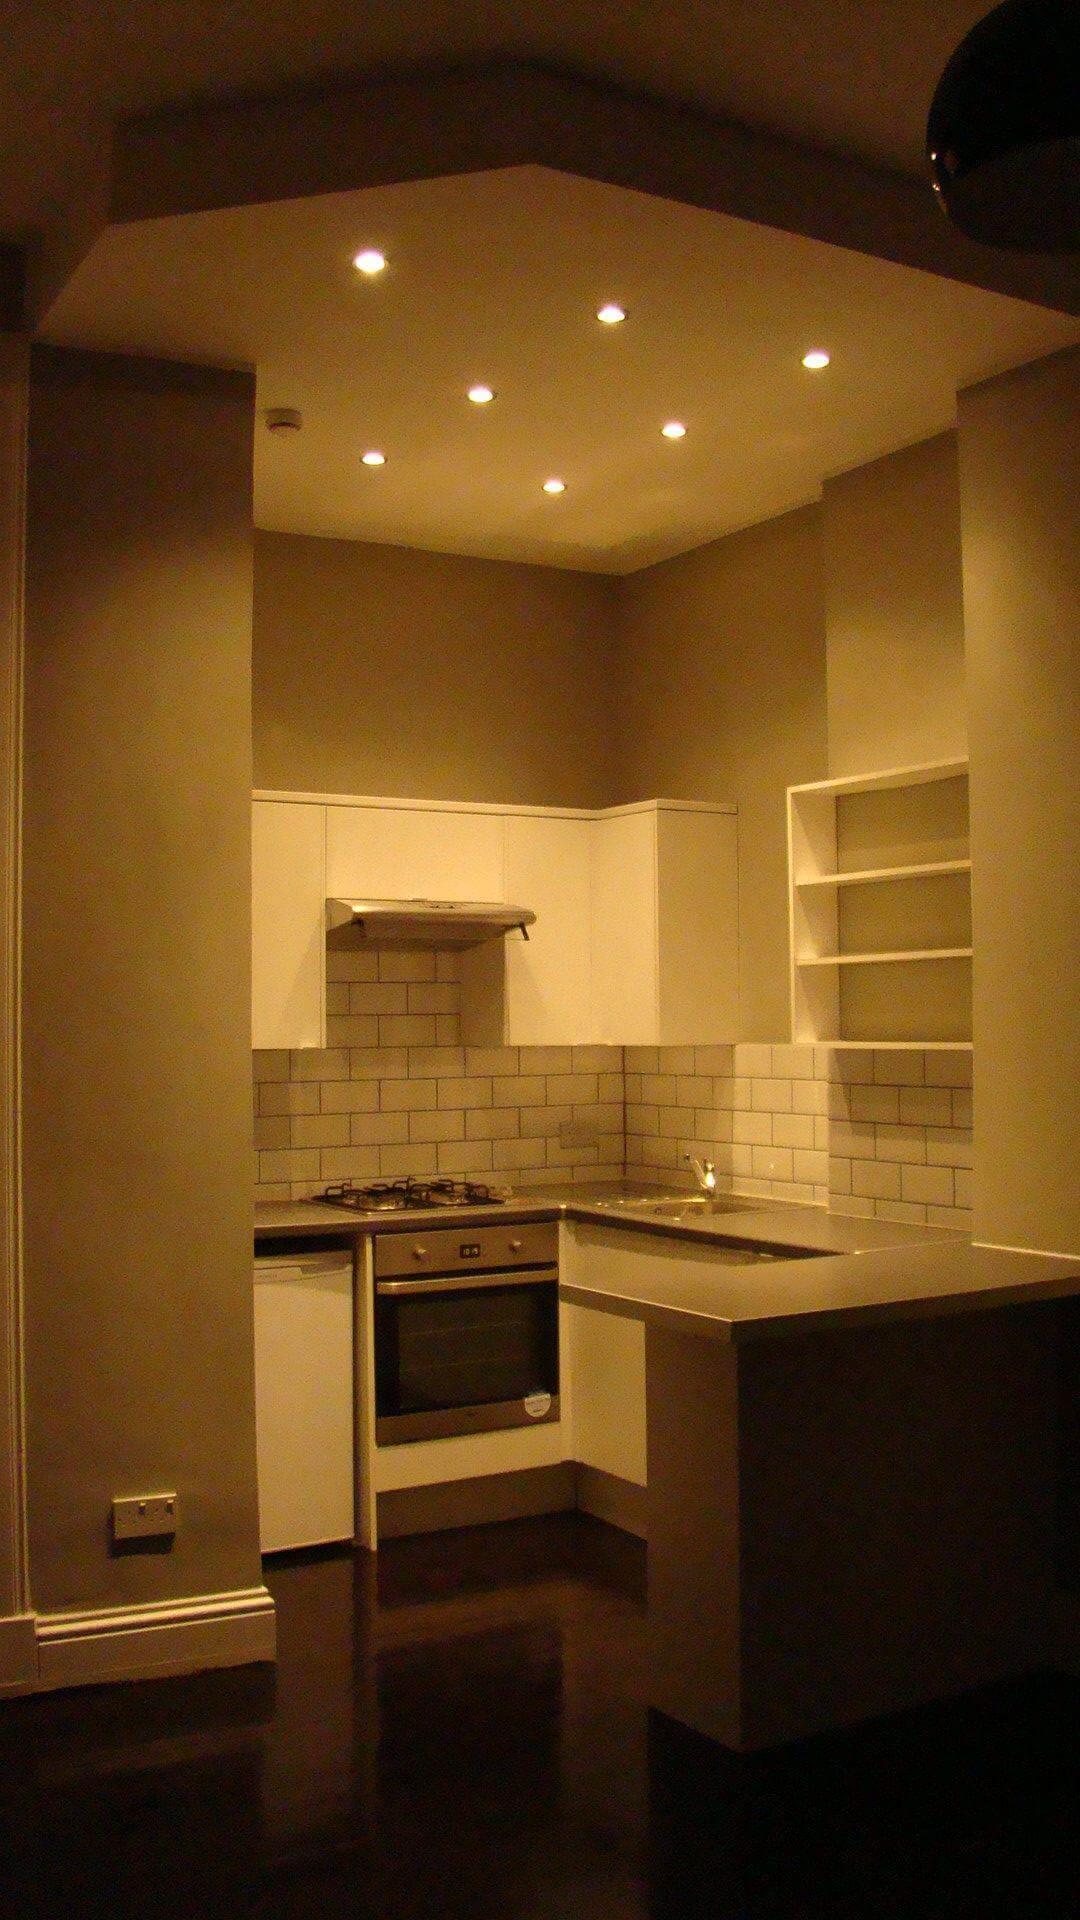 kitchen after refurbishment, suspended ceiling